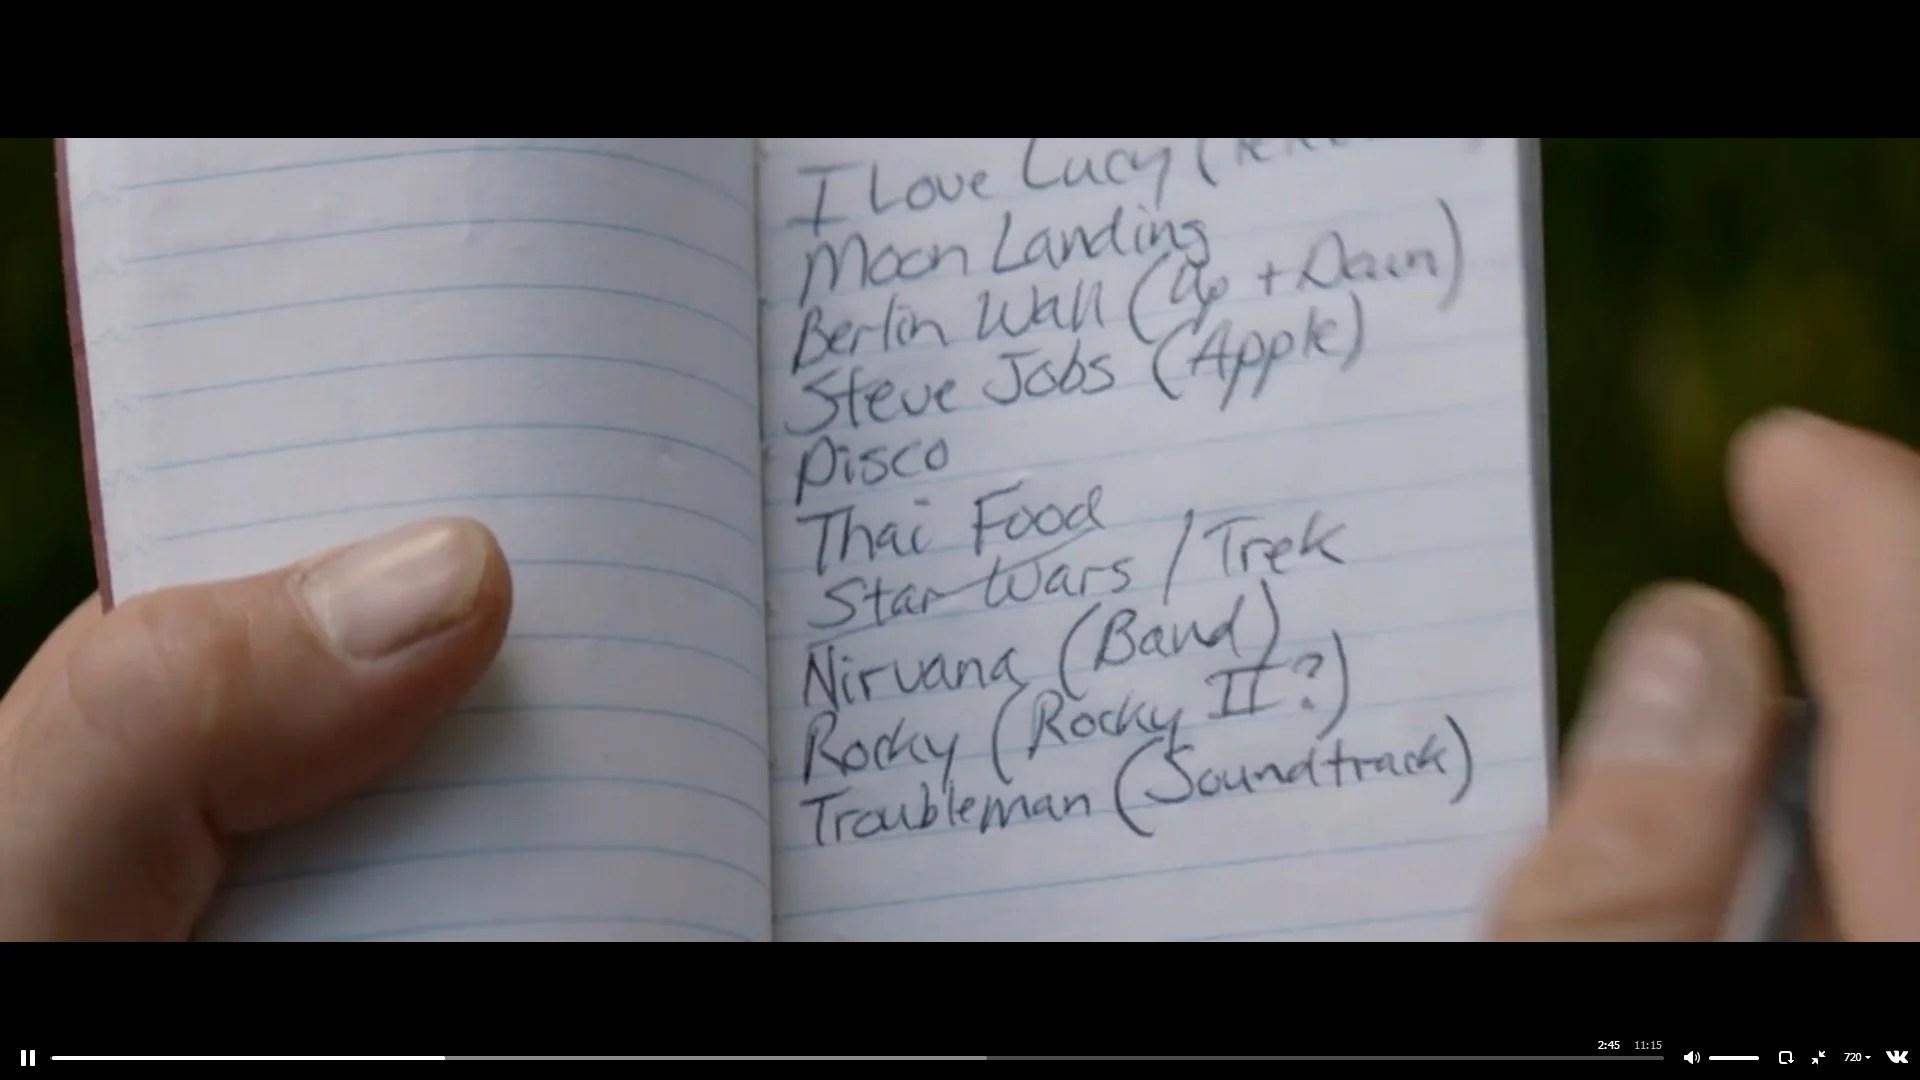 Steve Rogers List Of Things He Doesnt Understand In Captain America 2